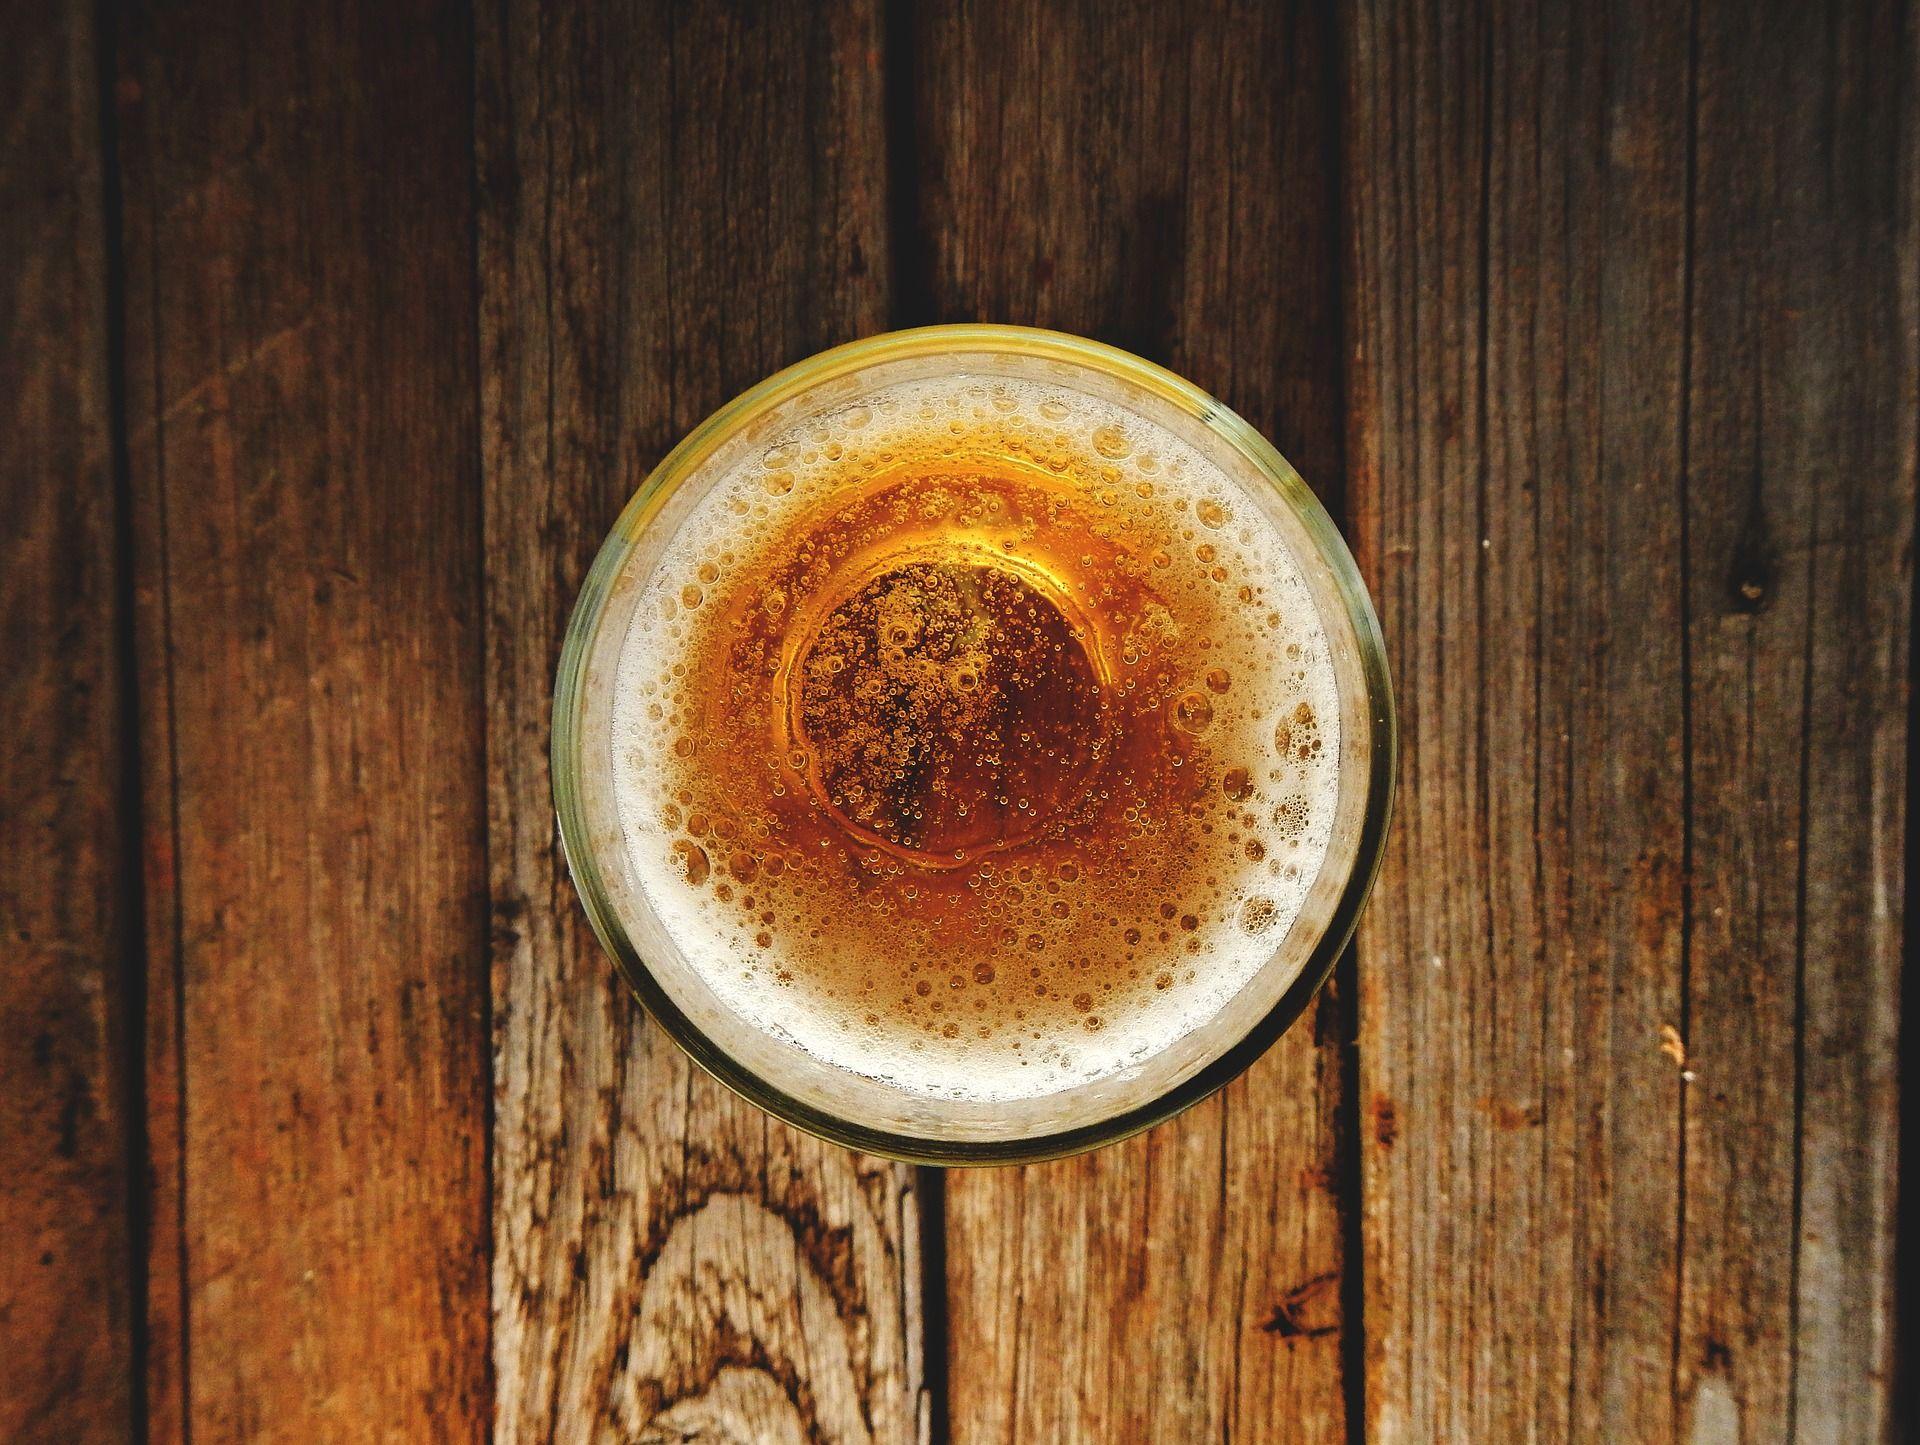 réussir sa bière